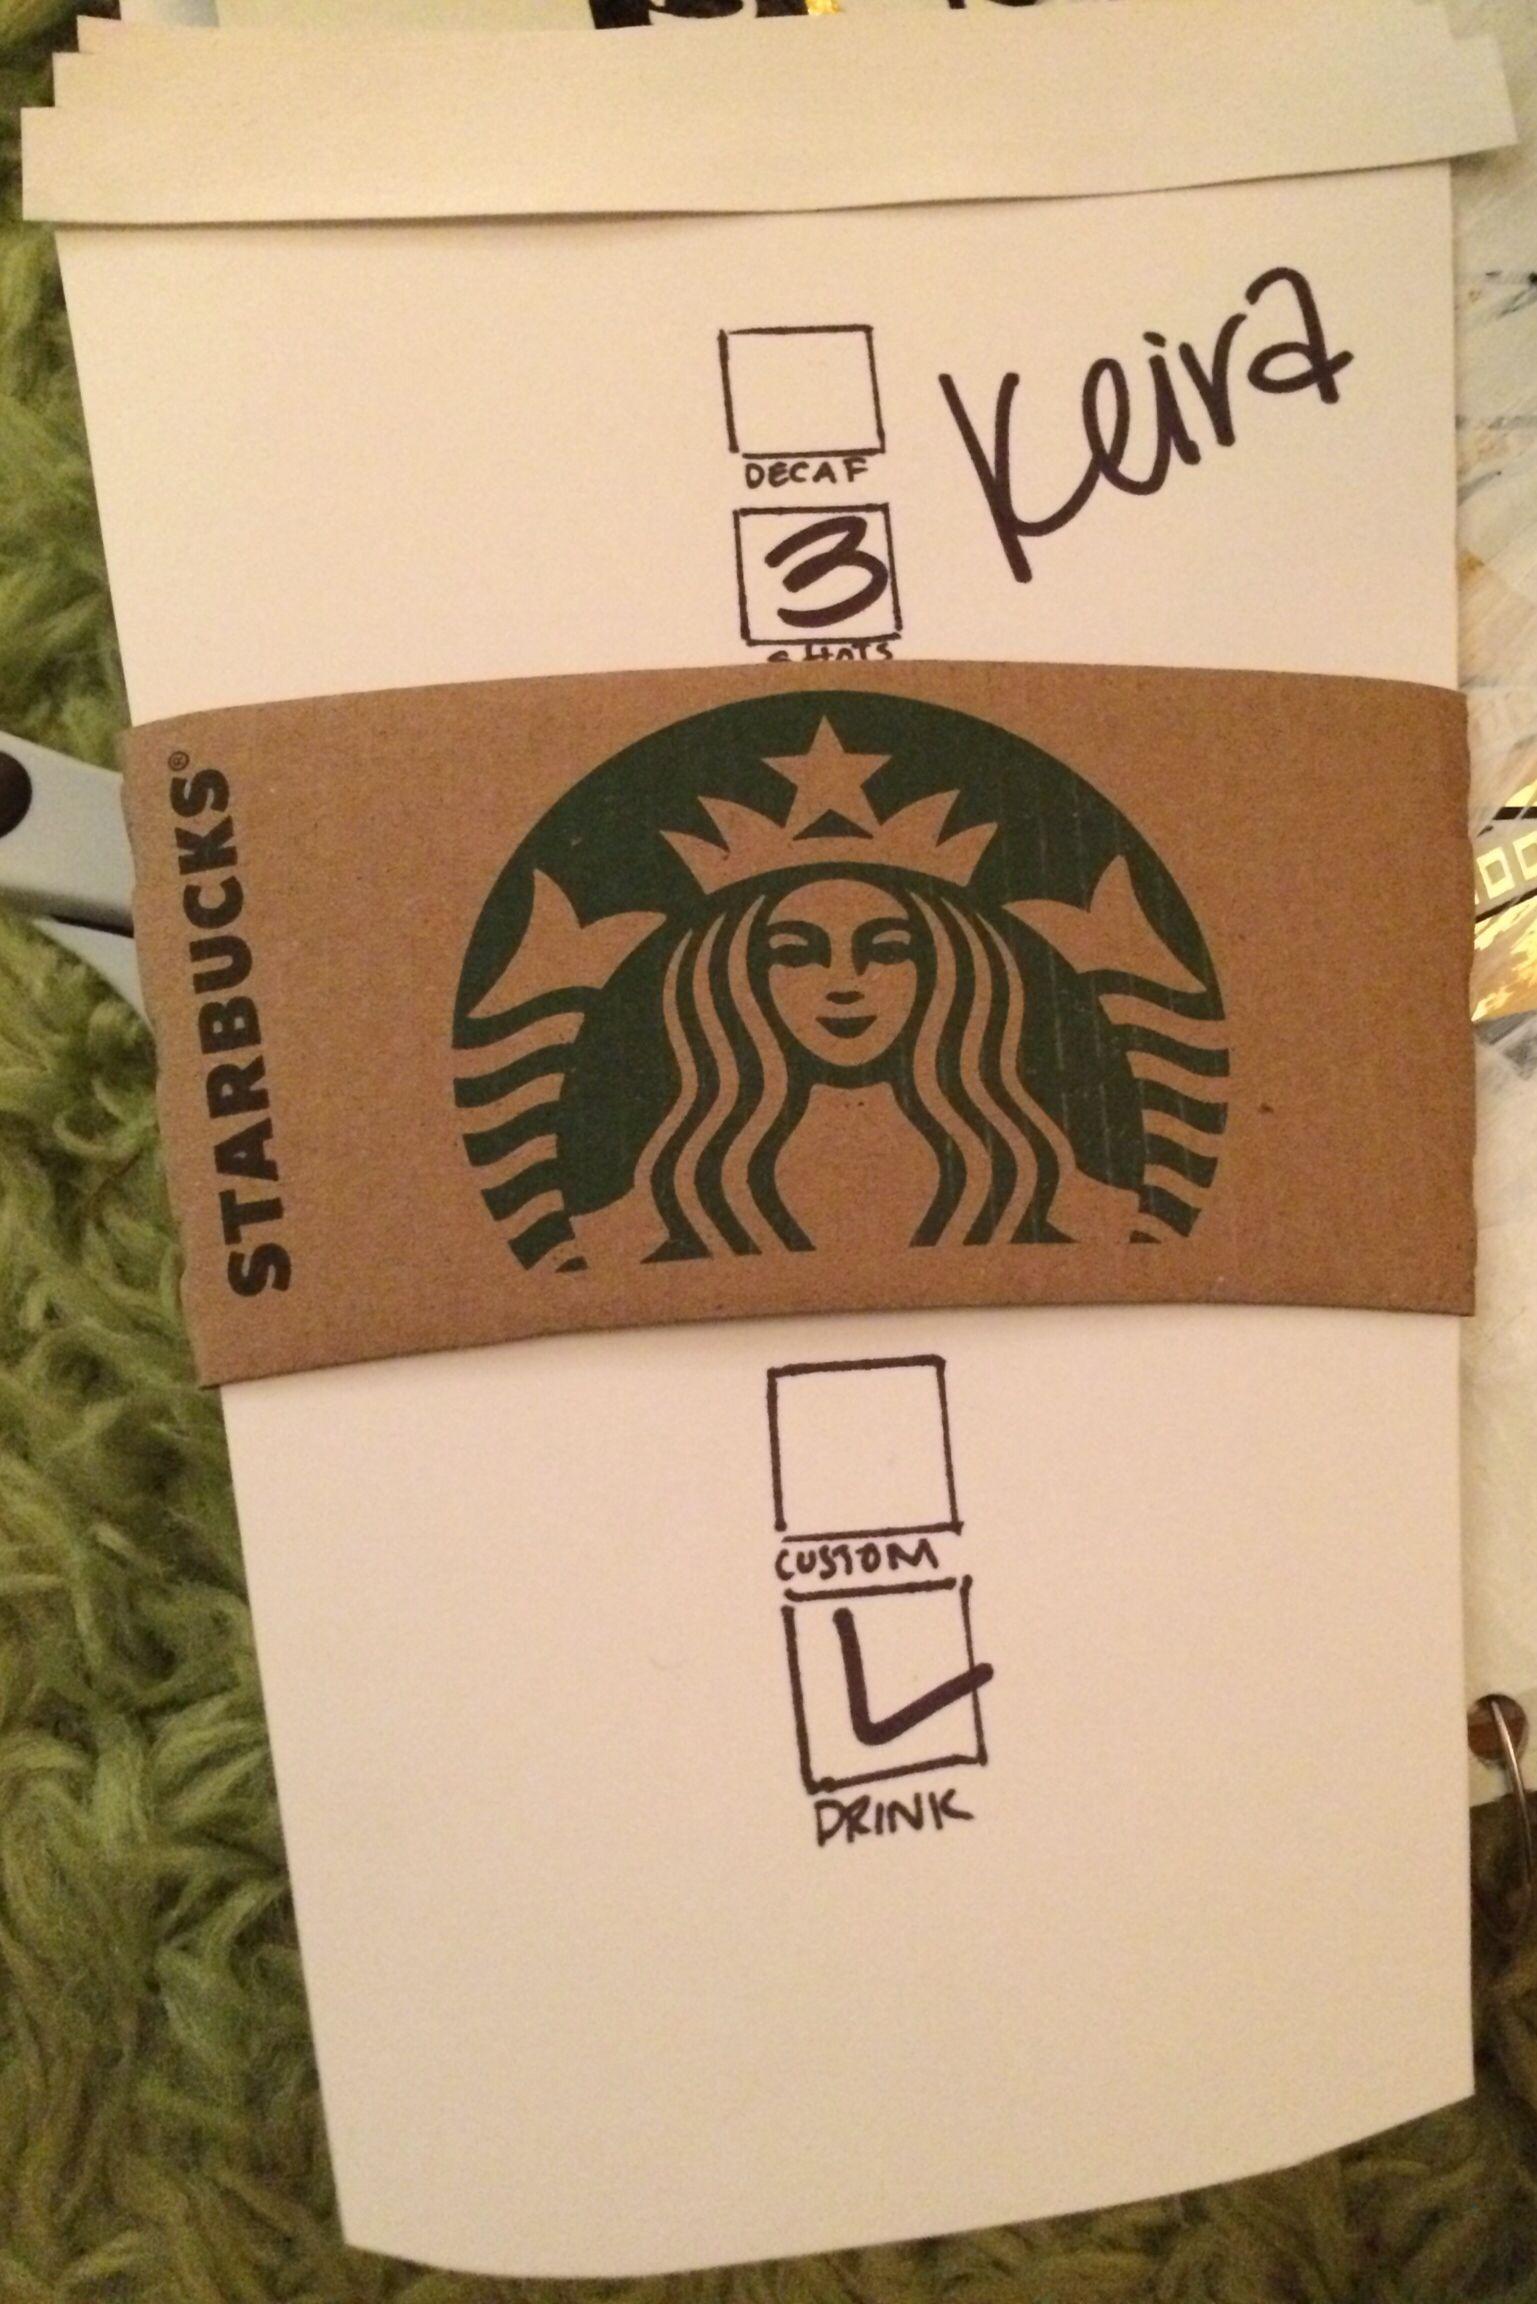 Ra door decs  sc 1 st  Pinterest & Spring quarter door decs - Starbucks cups! Use \